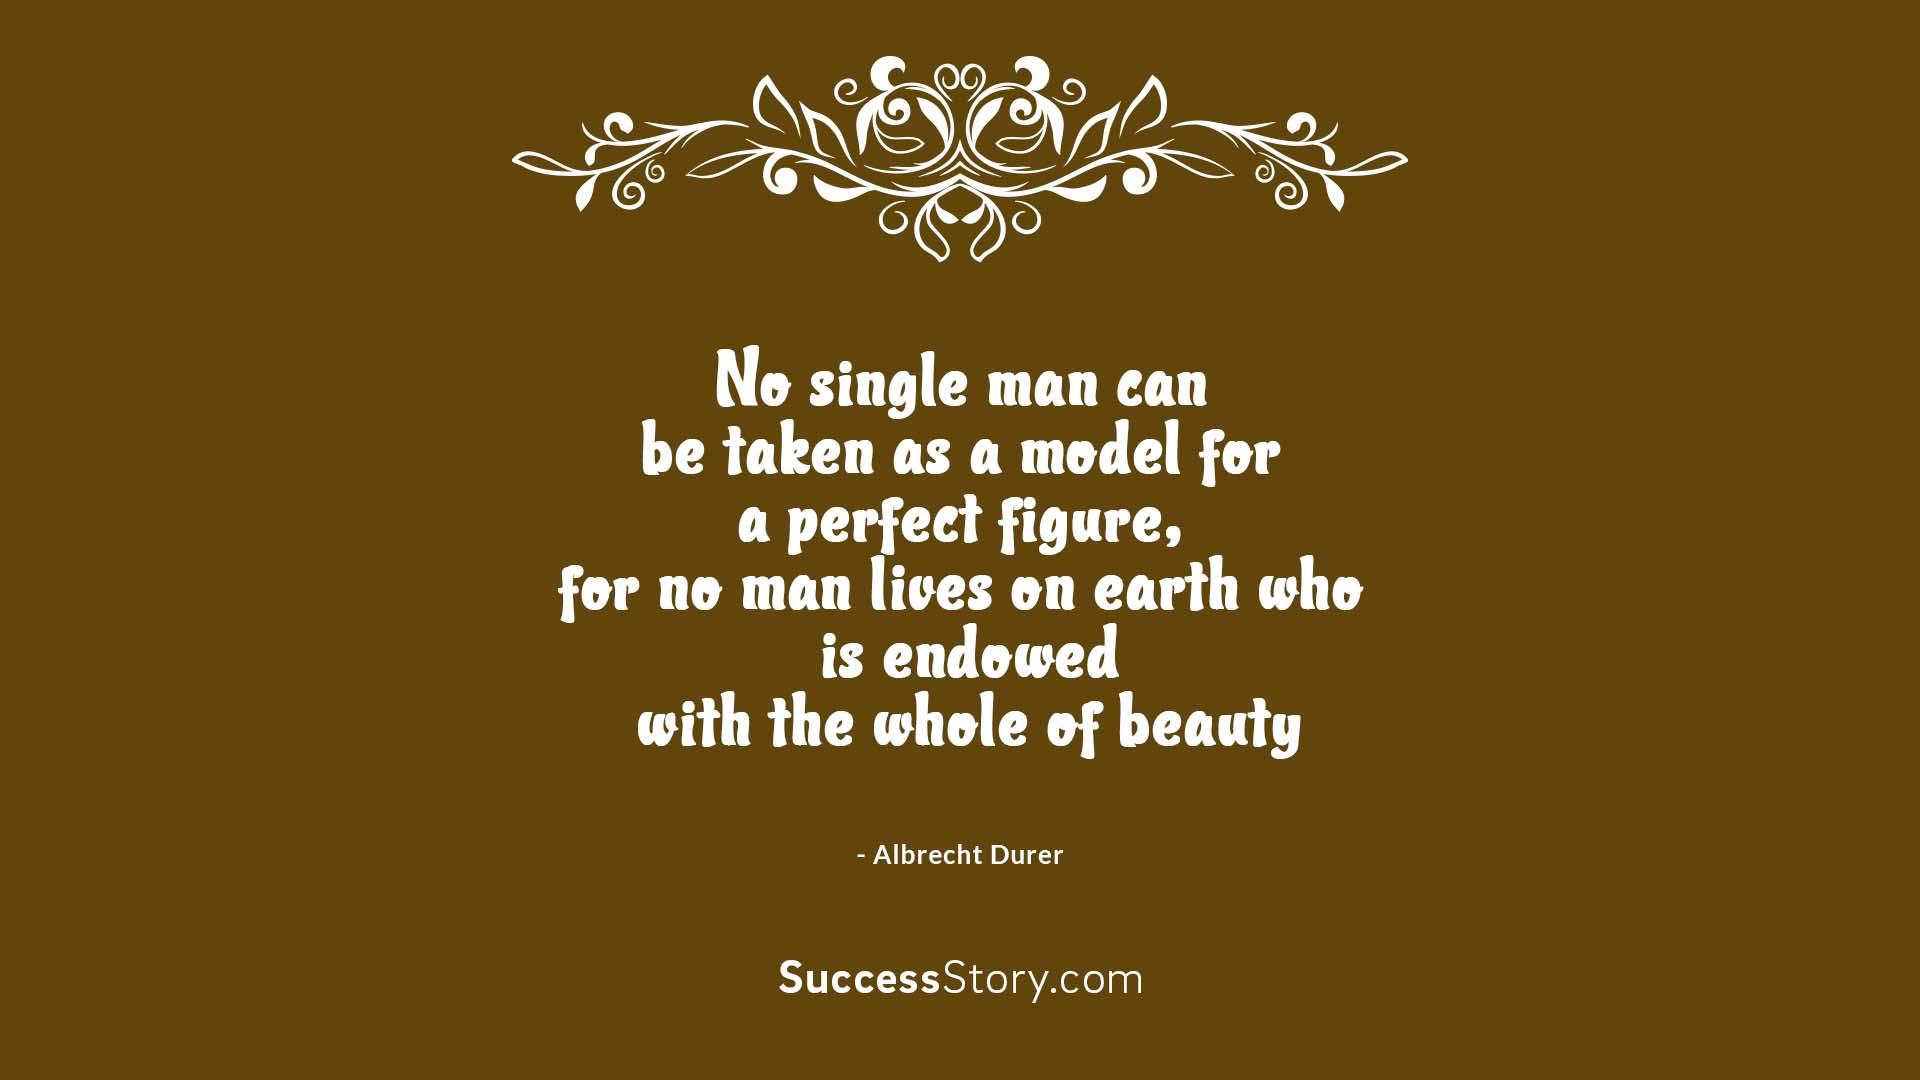 No single man can